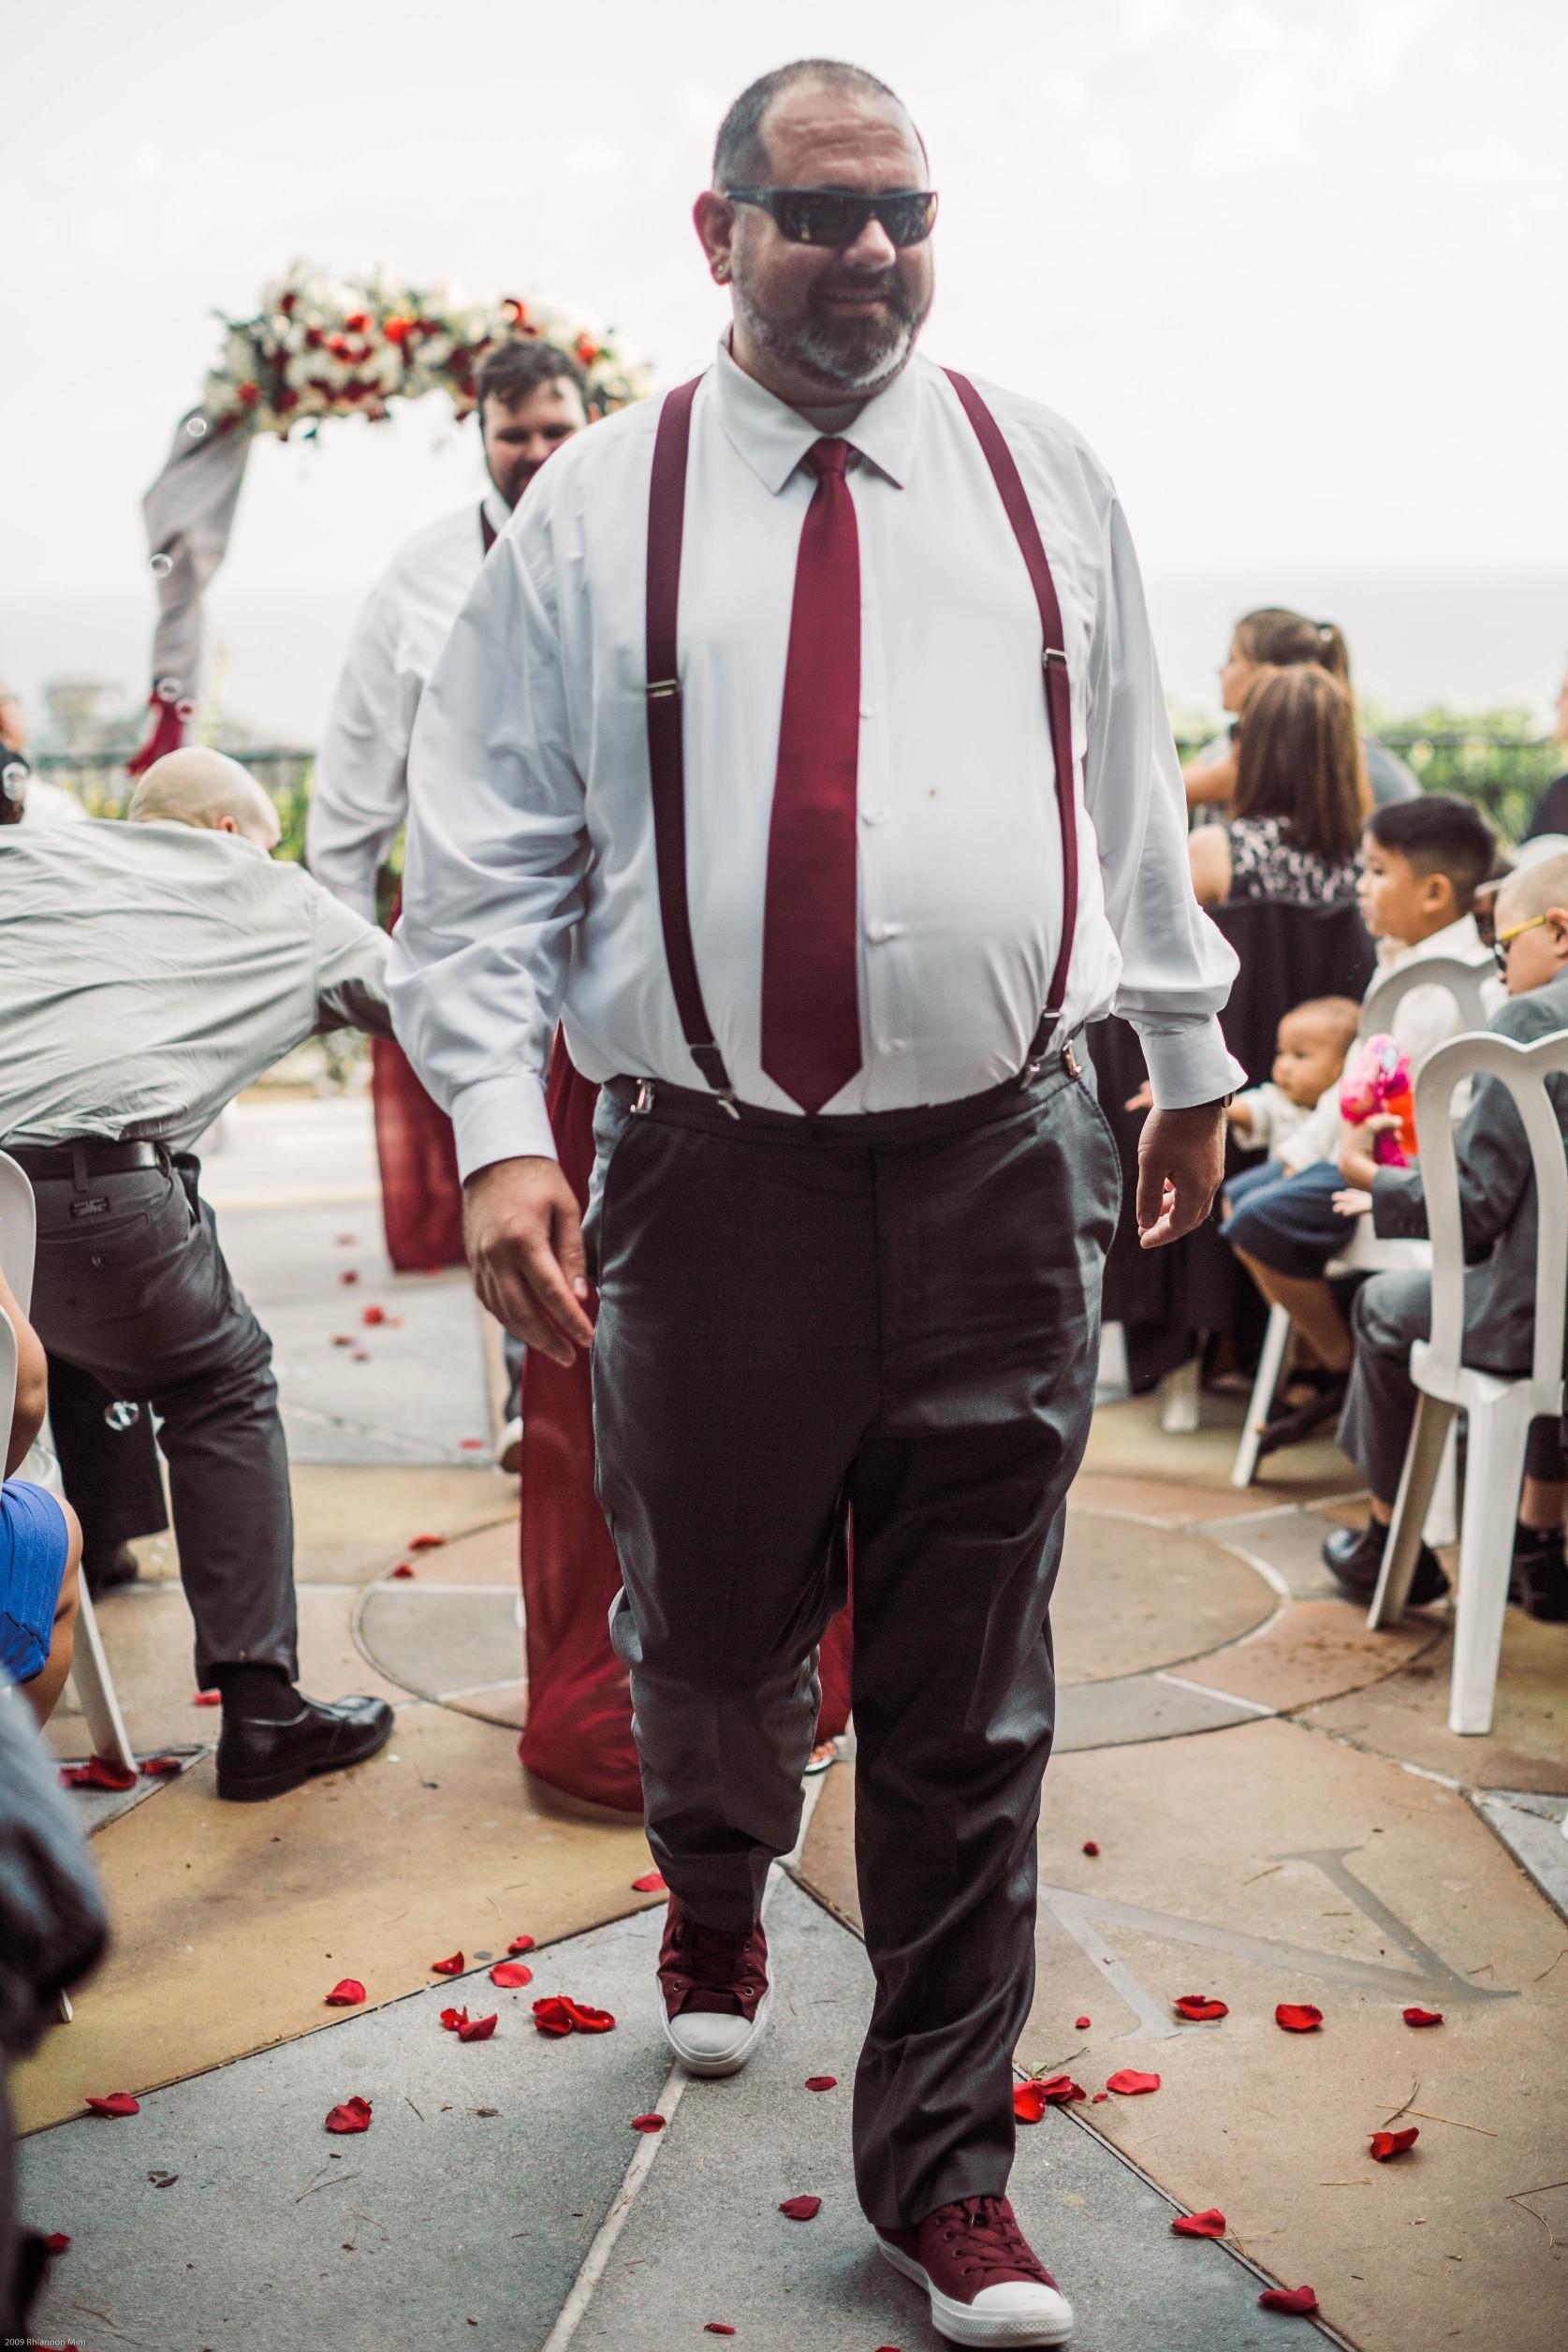 20170909_Wedding_0983